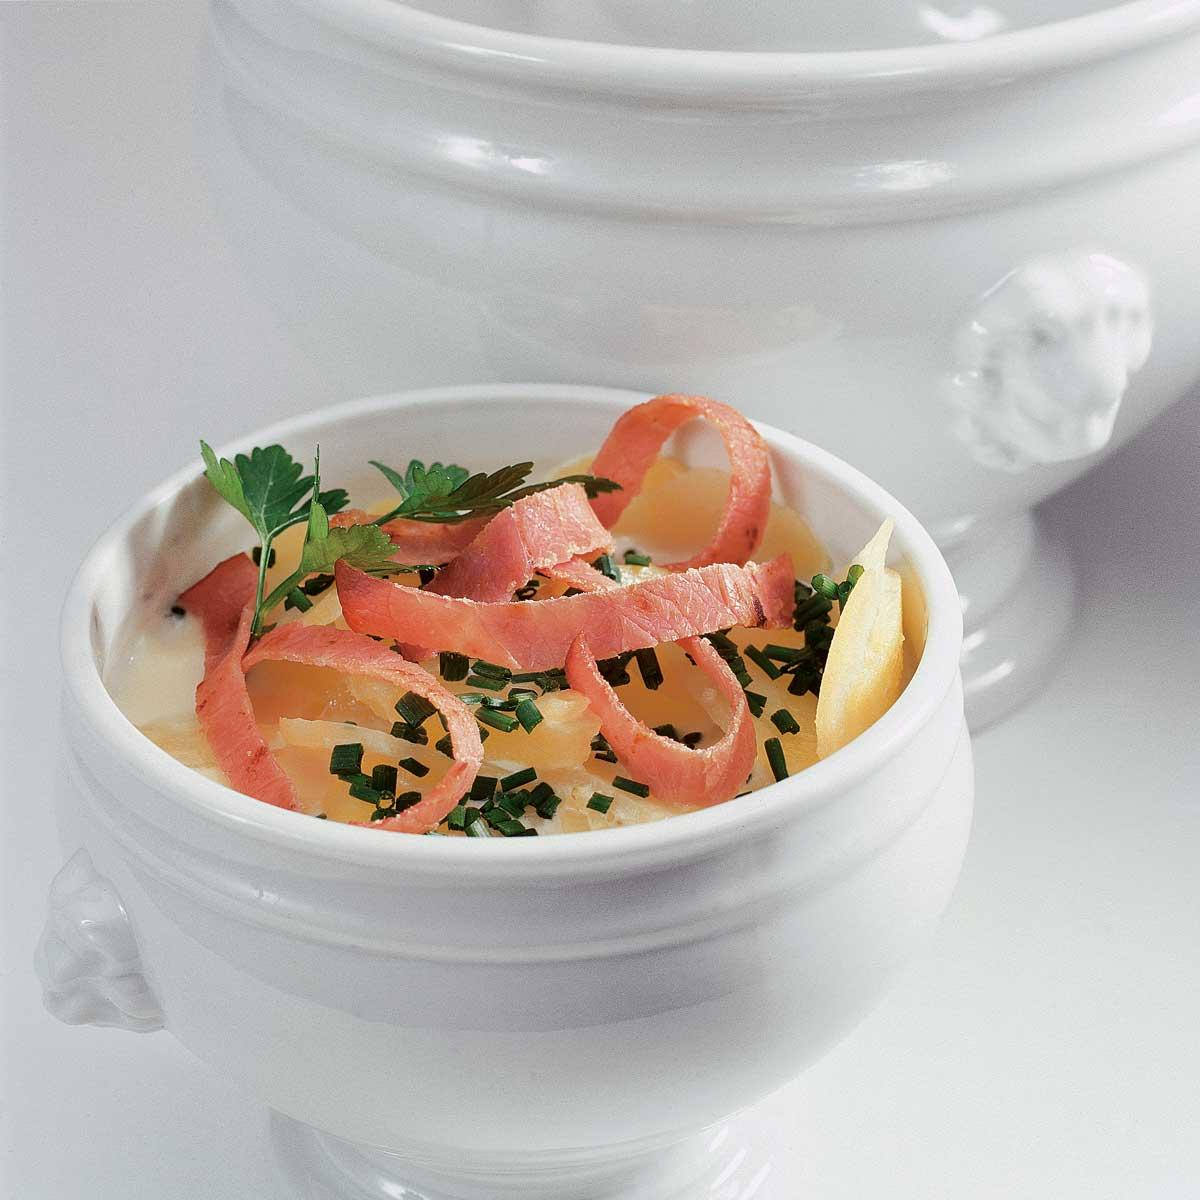 soupe irlandaise une recette soupe cuisine le figaro madame